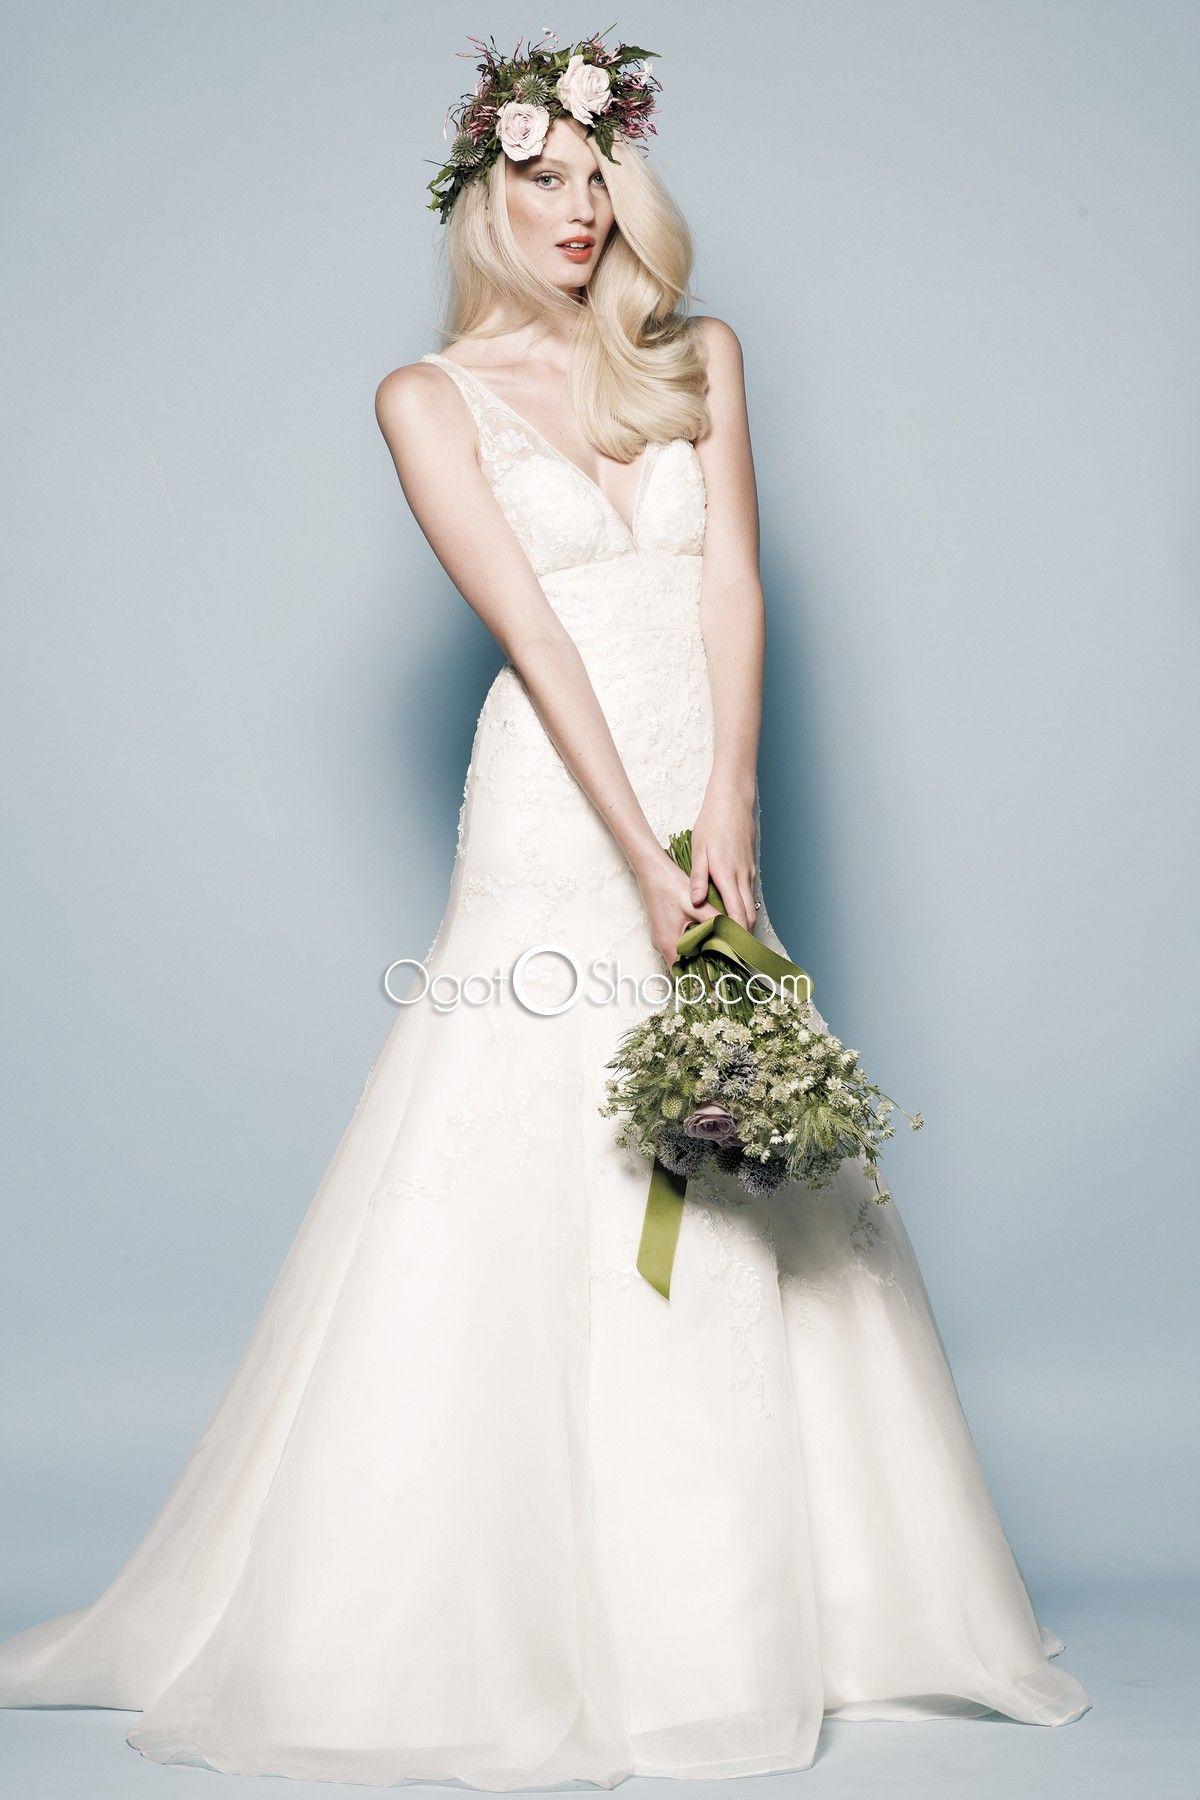 Pin by Kelly Turner on Wedding Dresses | Pinterest | Wedding dress ...